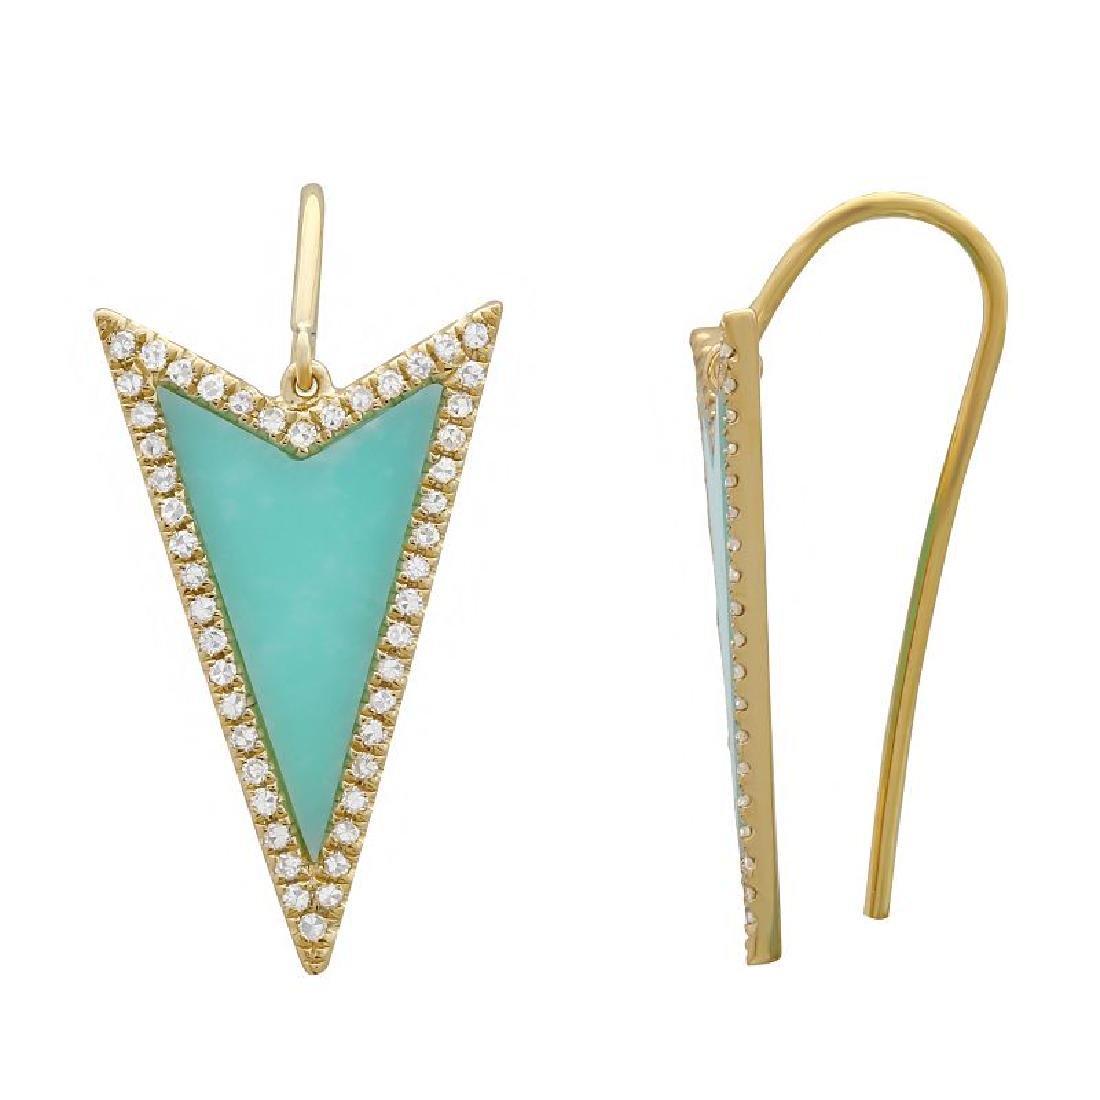 14KT Yellow Gold 1.08ctw Diamond  Turquoise Earrings - 2